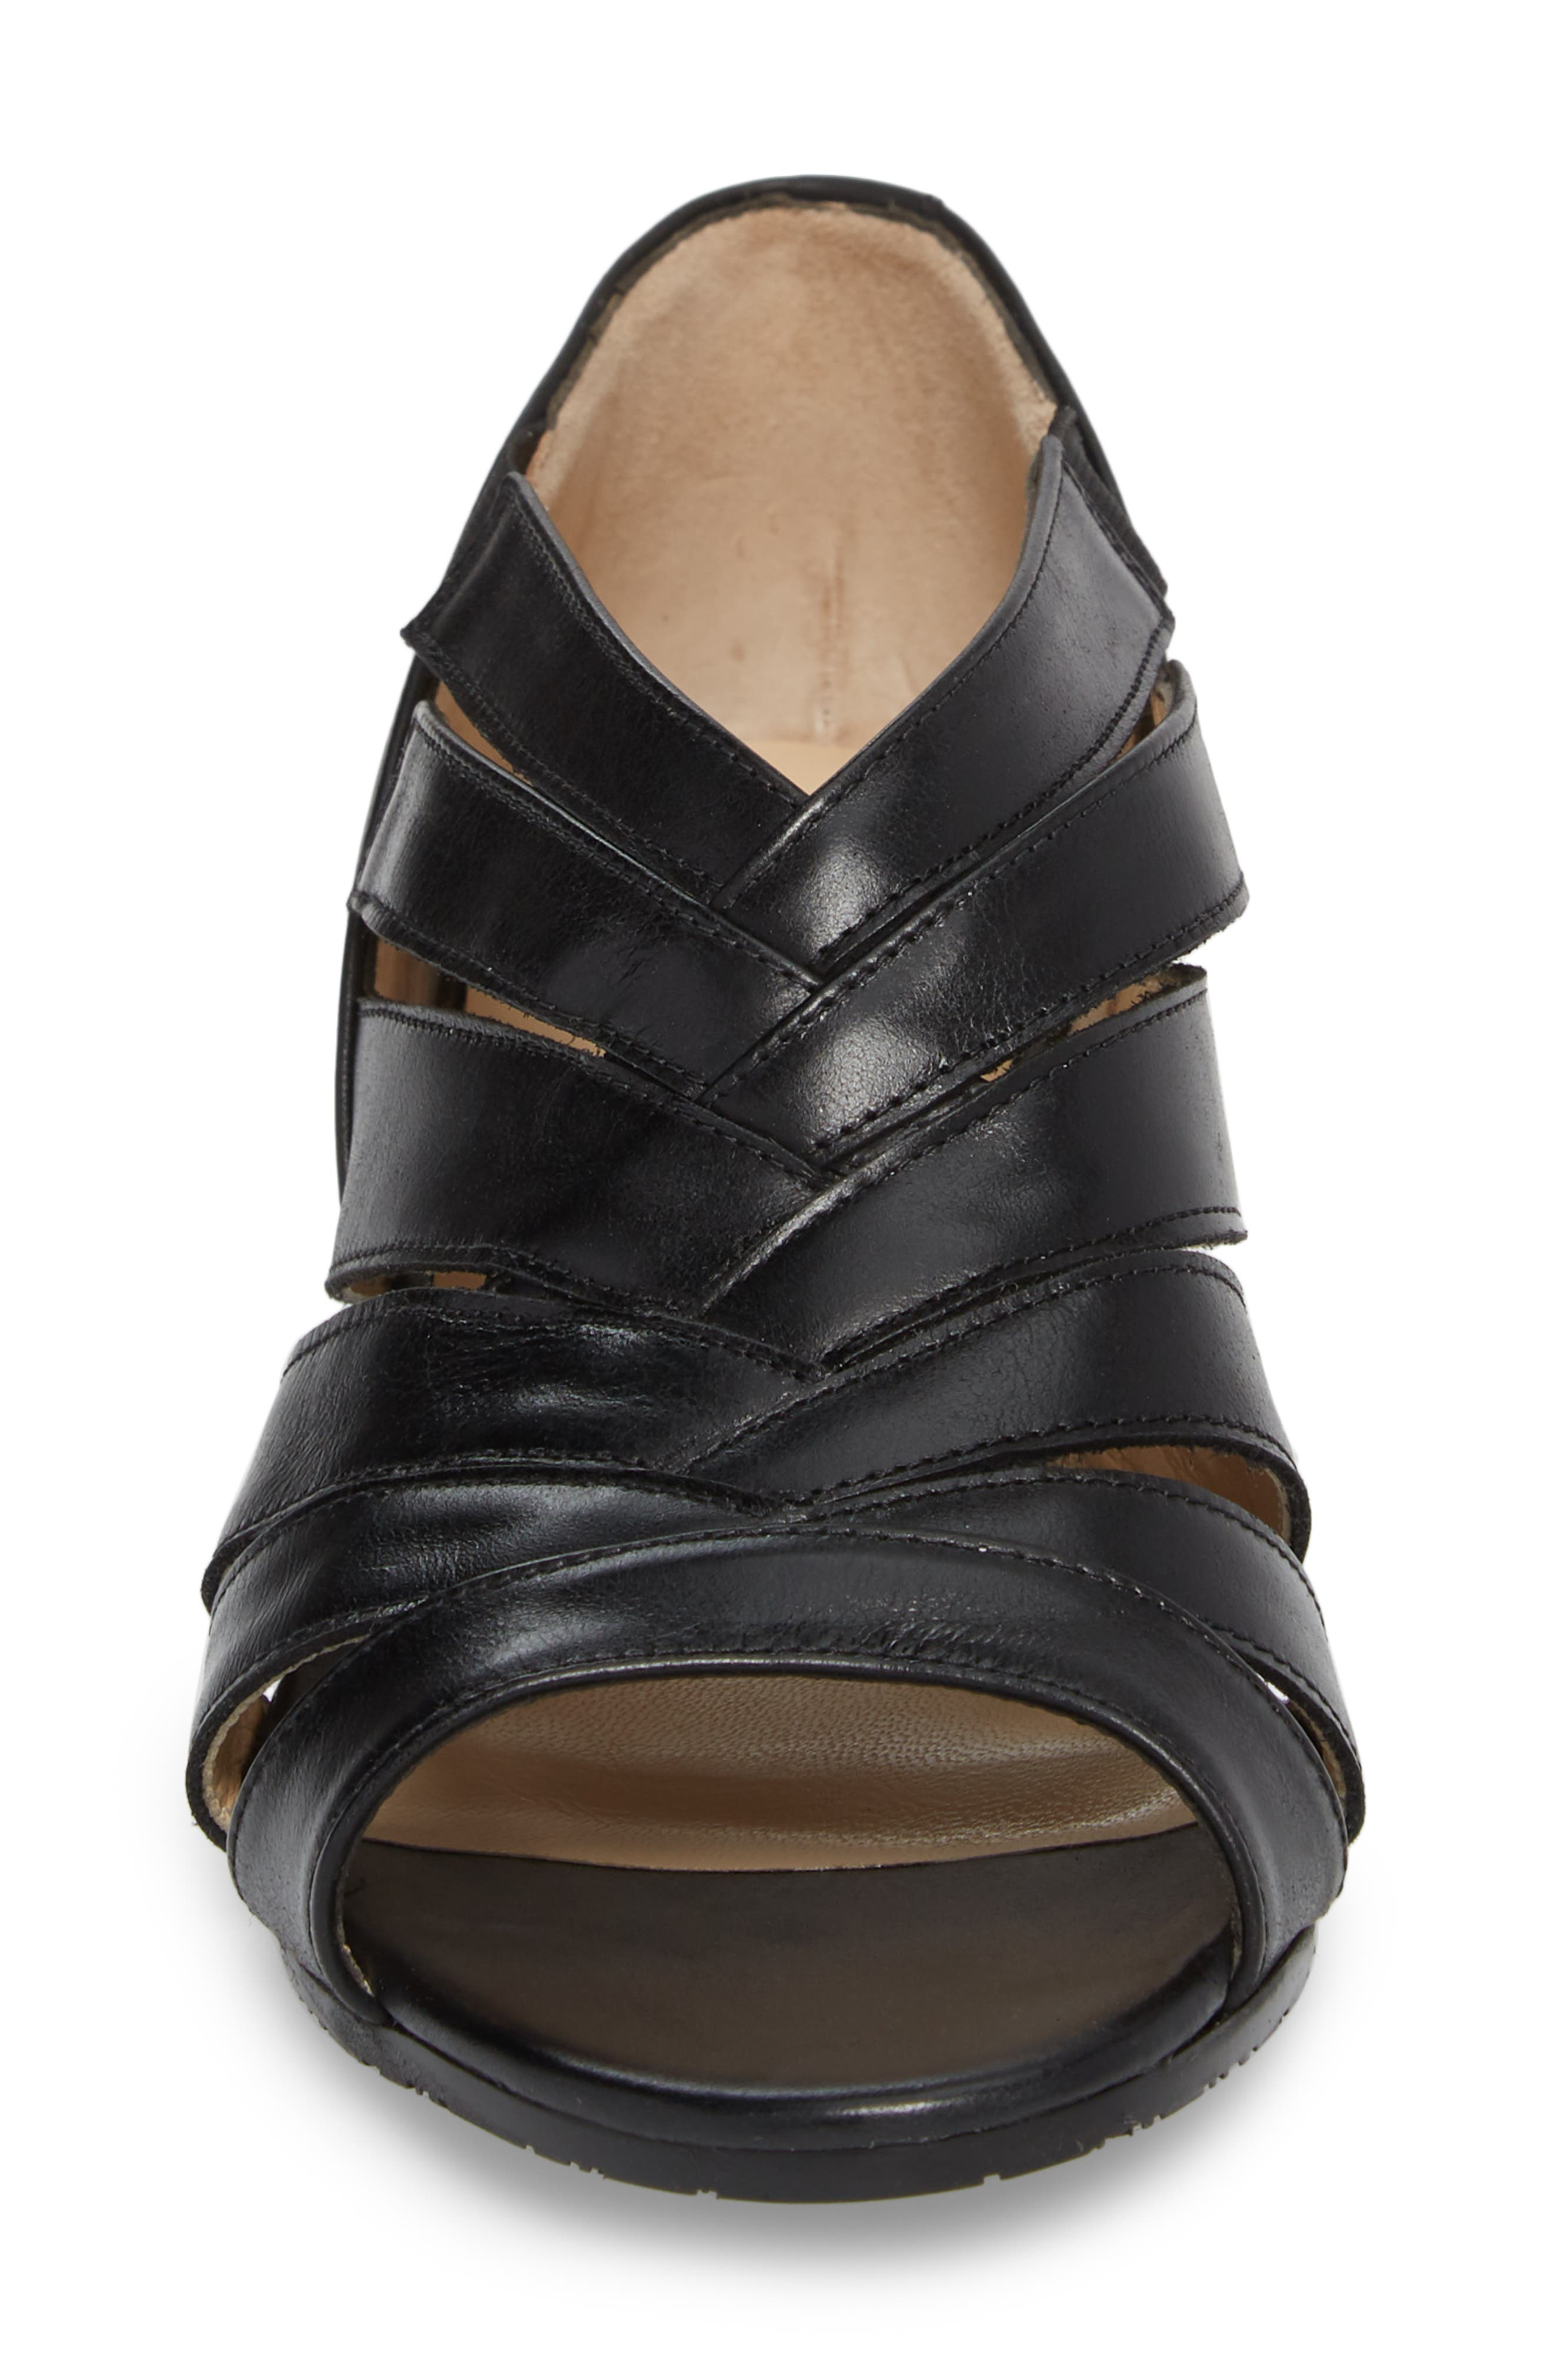 Demetra Sandal,                             Alternate thumbnail 4, color,                             Black Leather